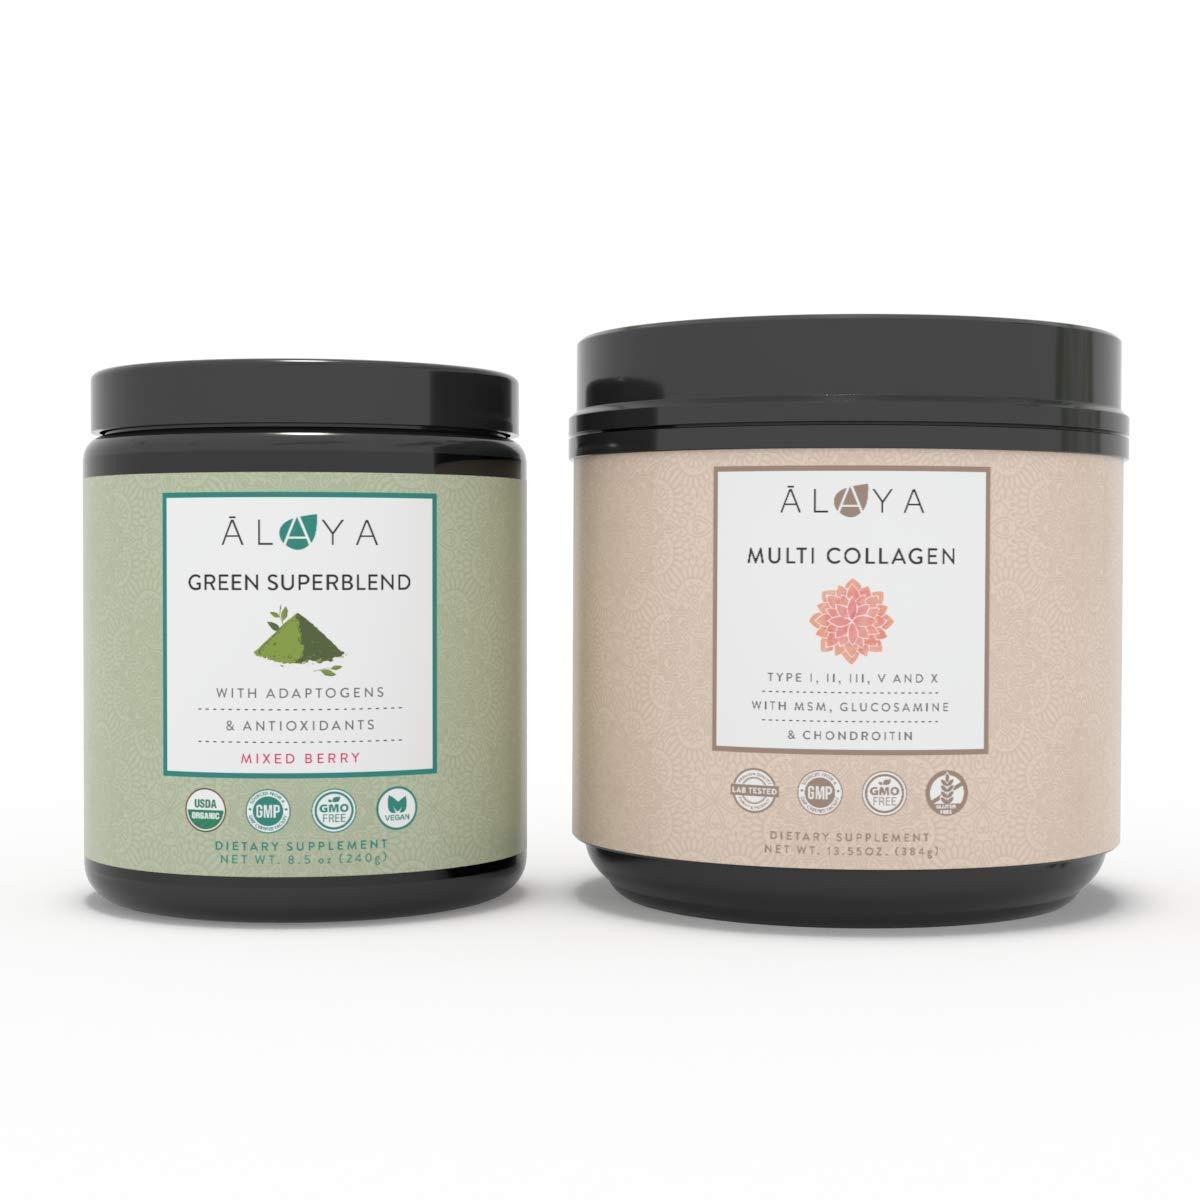 Alaya Naturals Multi Collagen and Organic Green Superblend Bundle